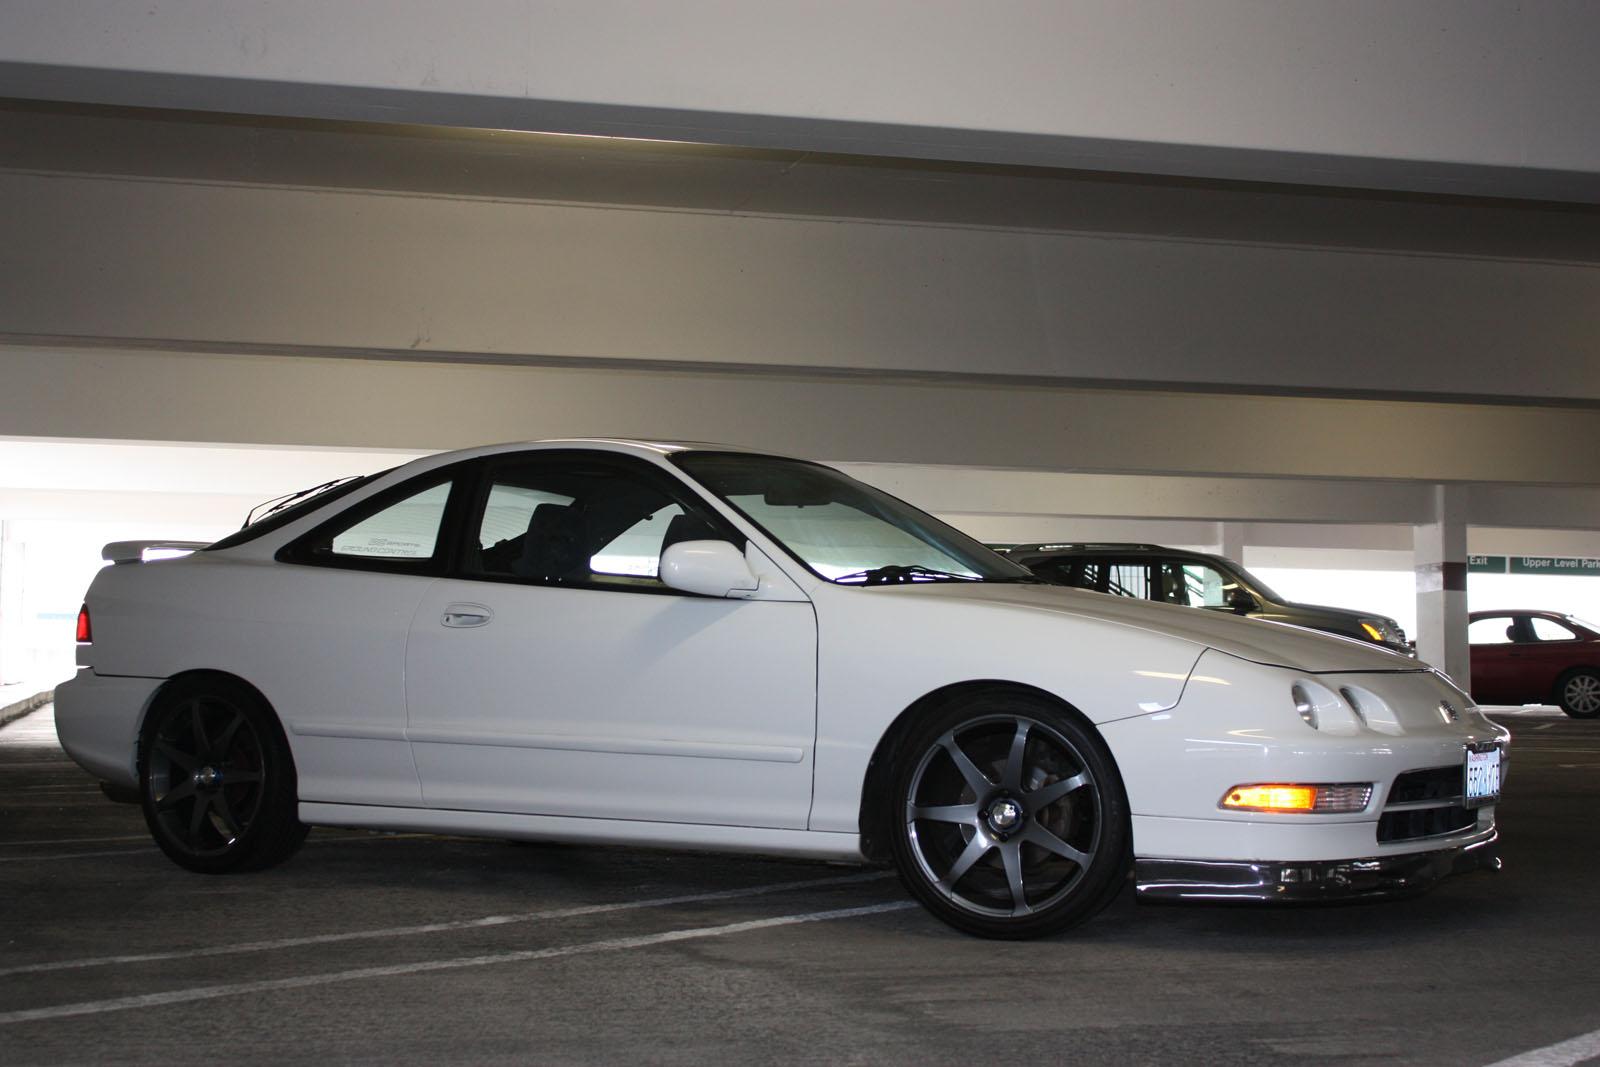 White 1995 Acura Integra Coupe